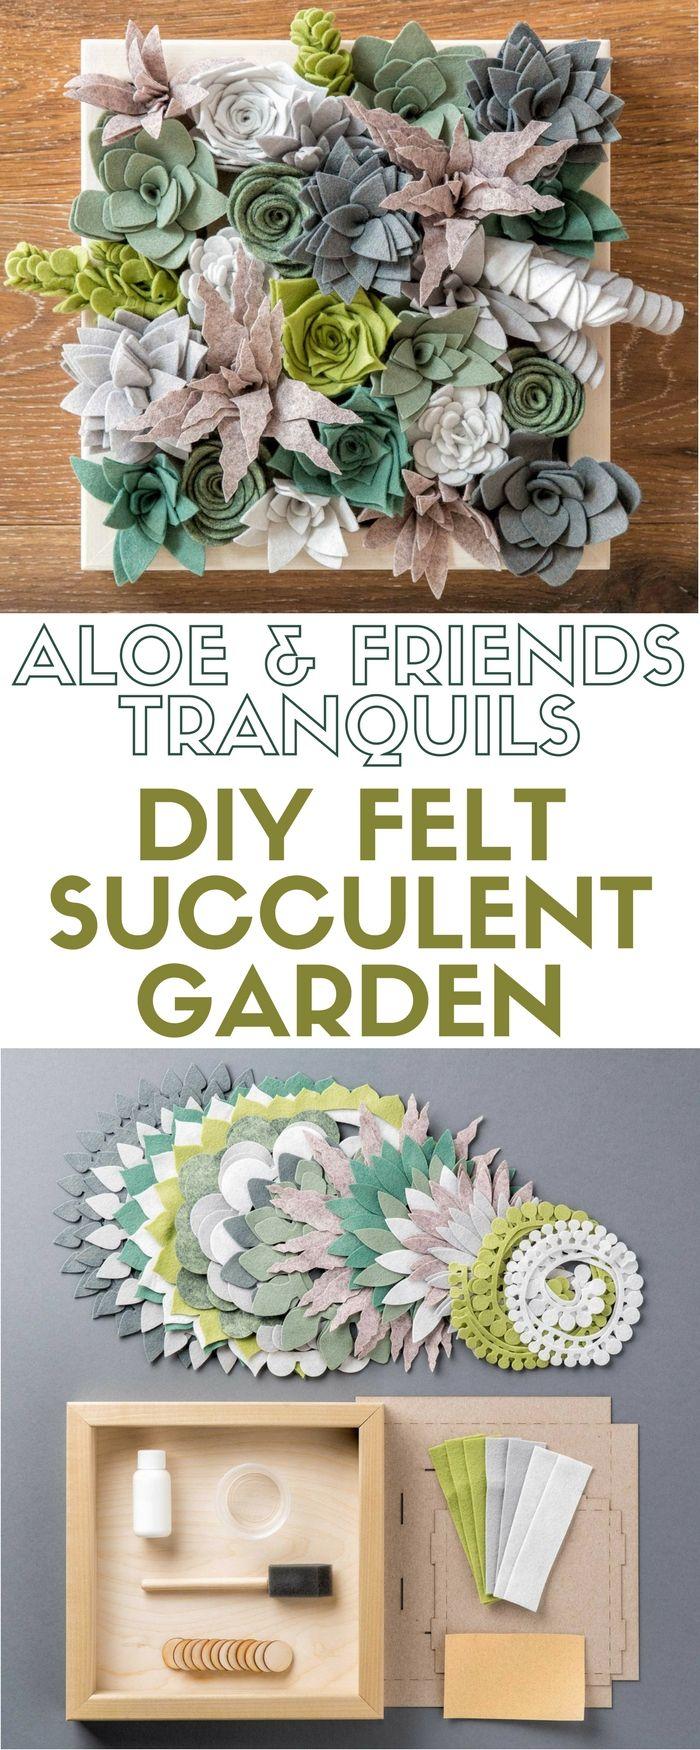 Aloe & Friends - Tranquils | DIY Felt Succulent Garden | Craft Kit | Succulents | Felt | Indoor